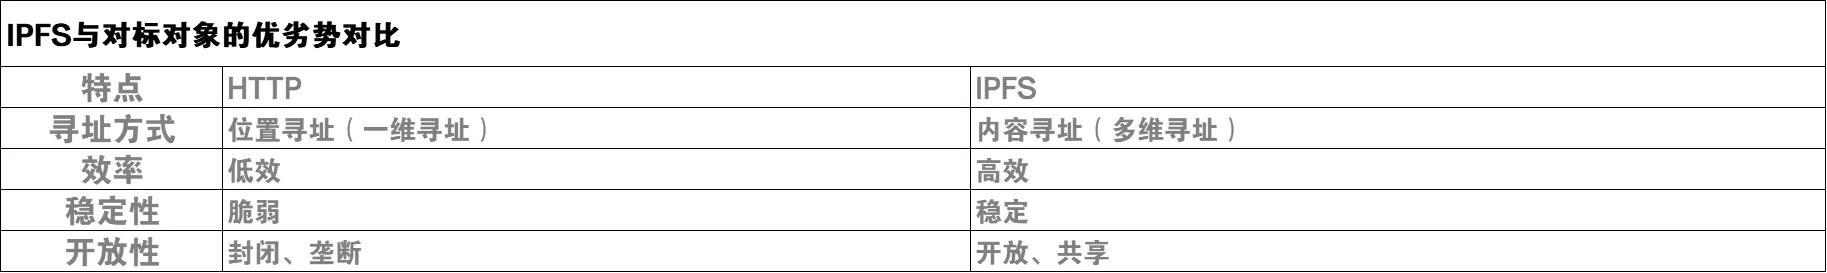 IPFS与对标对象的优劣势对比